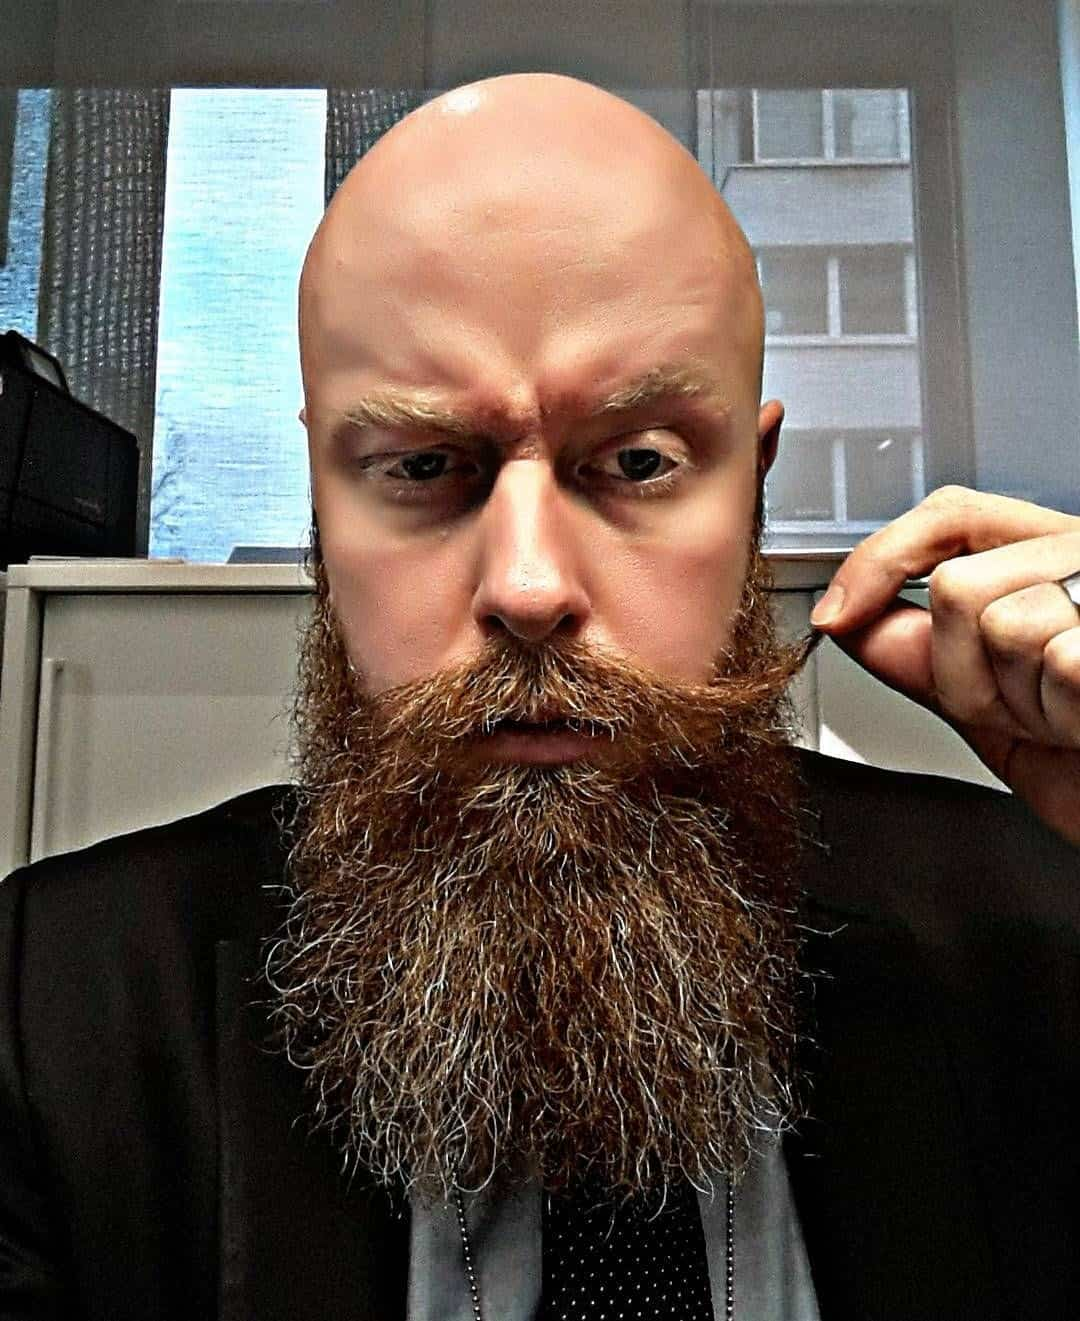 The bad-man bald and beard